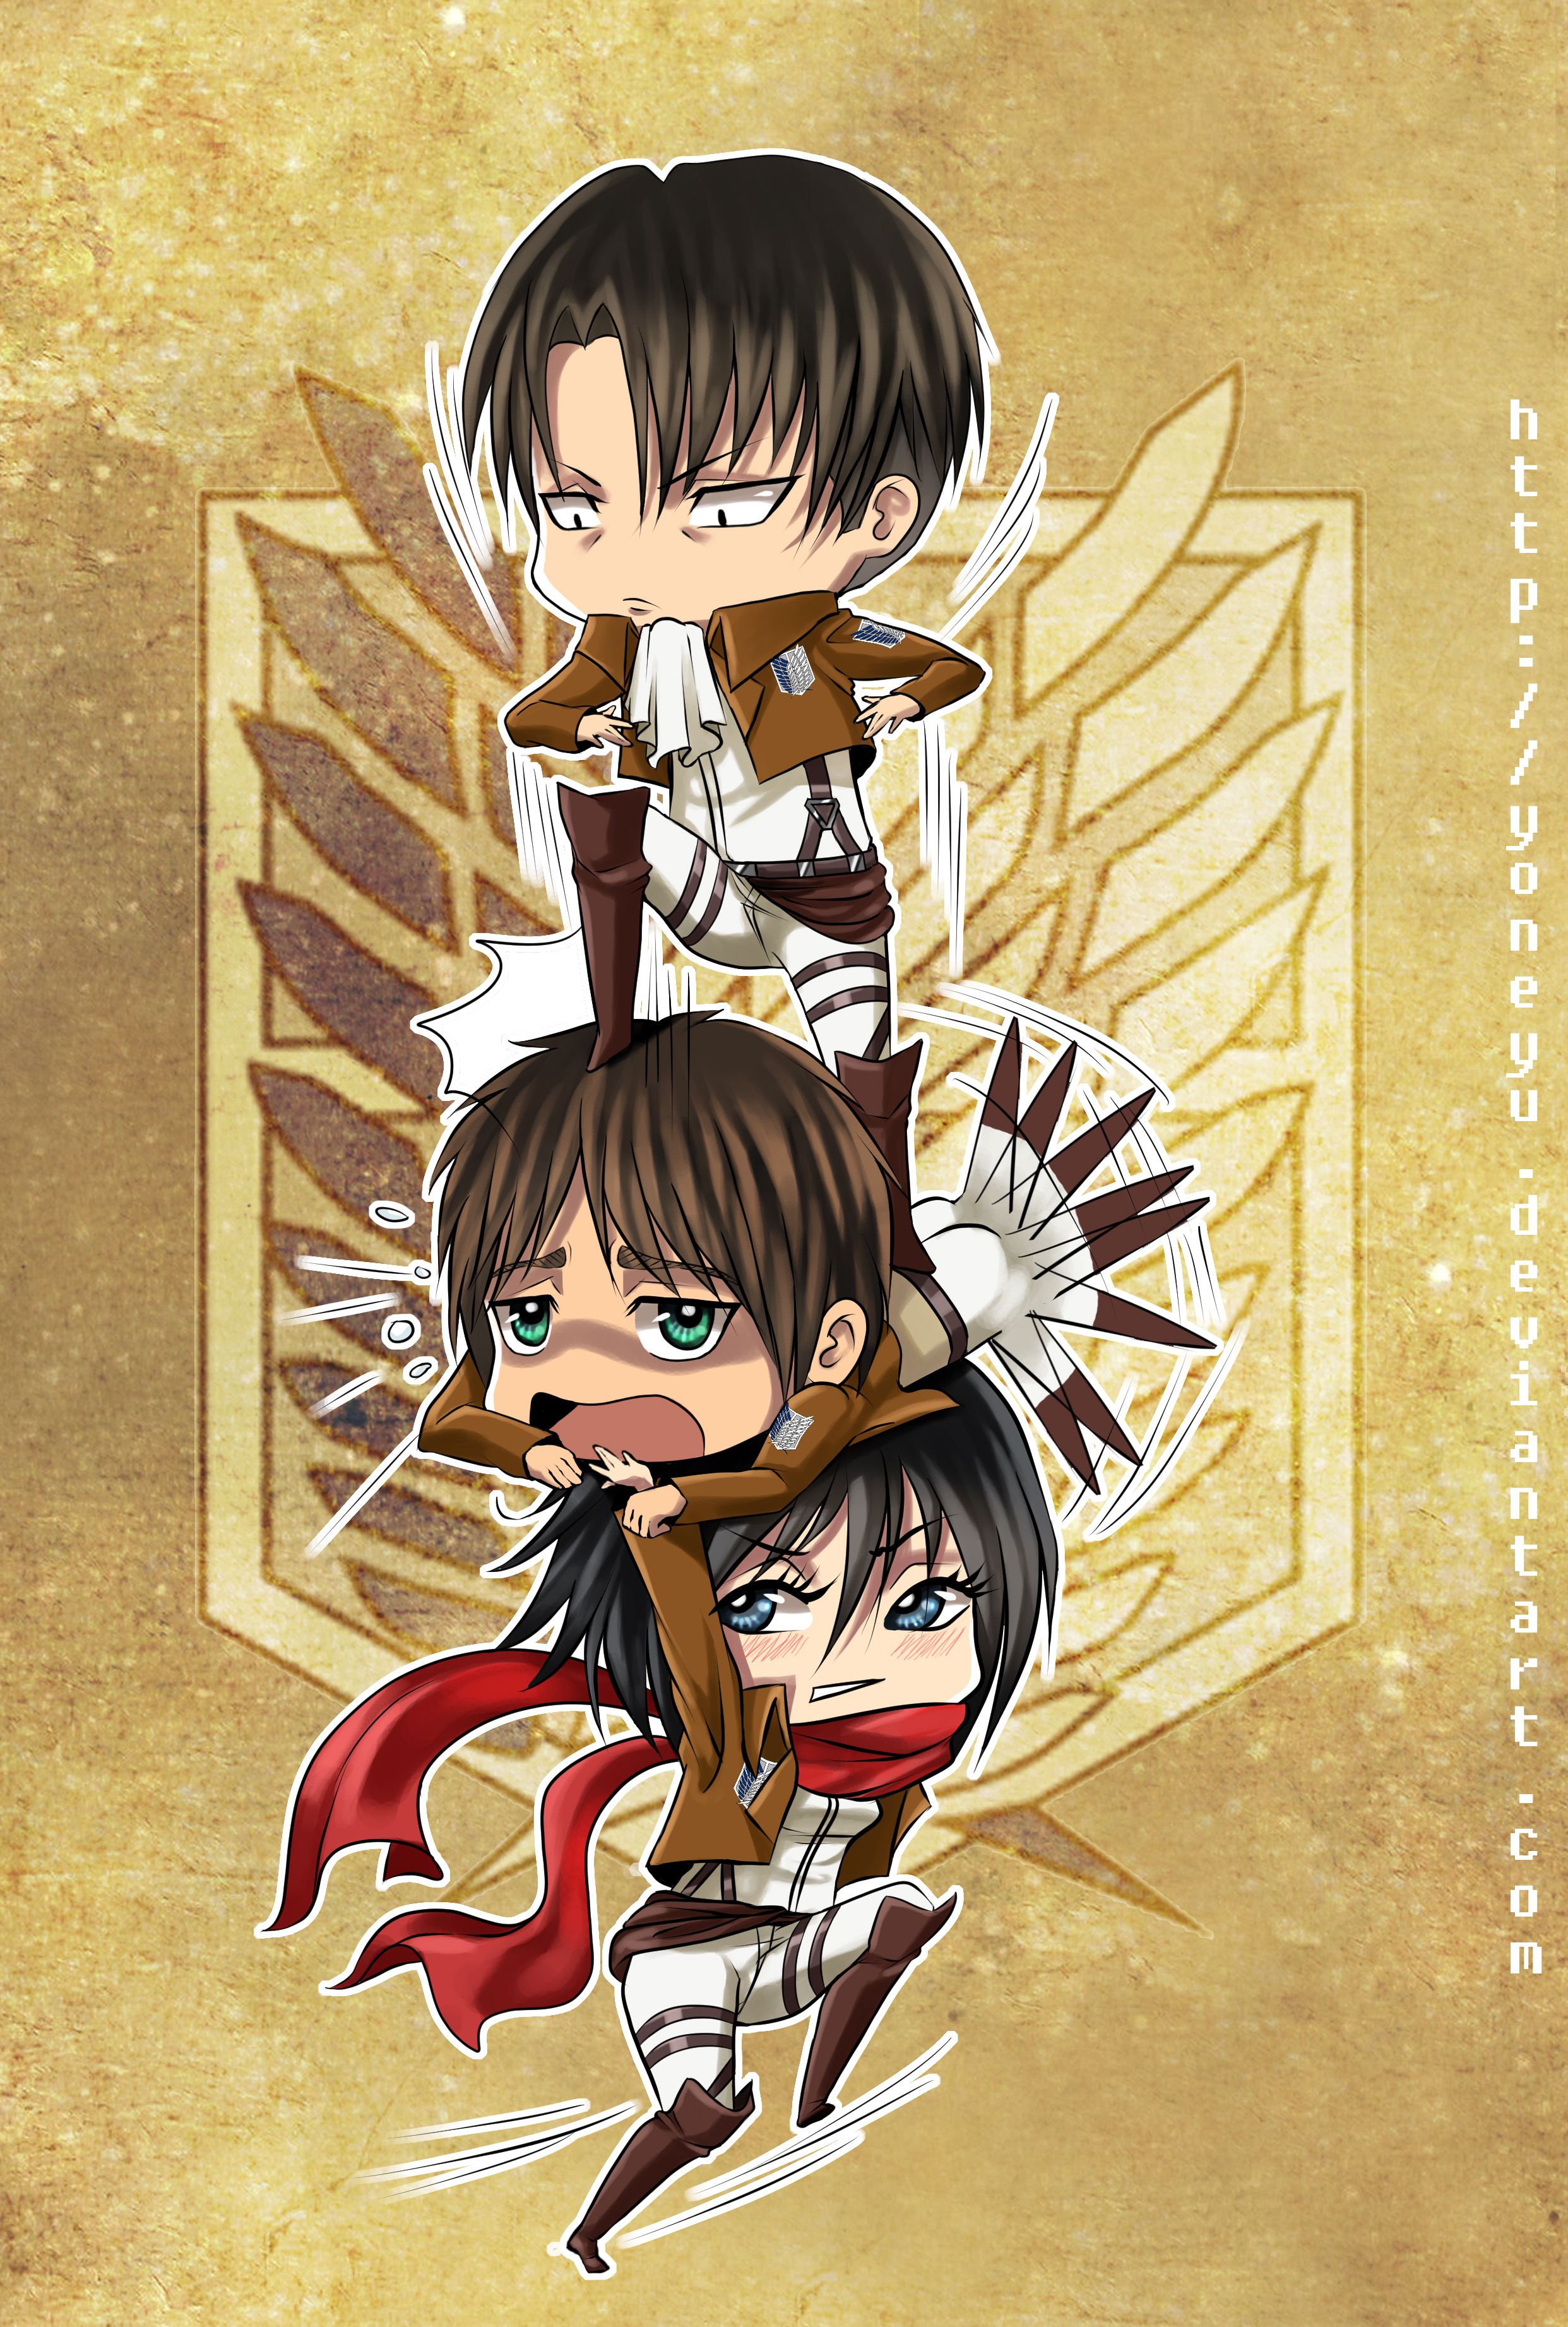 Attack On Titan Mobile Wallpaper 1572266 Zerochan Anime Image Board